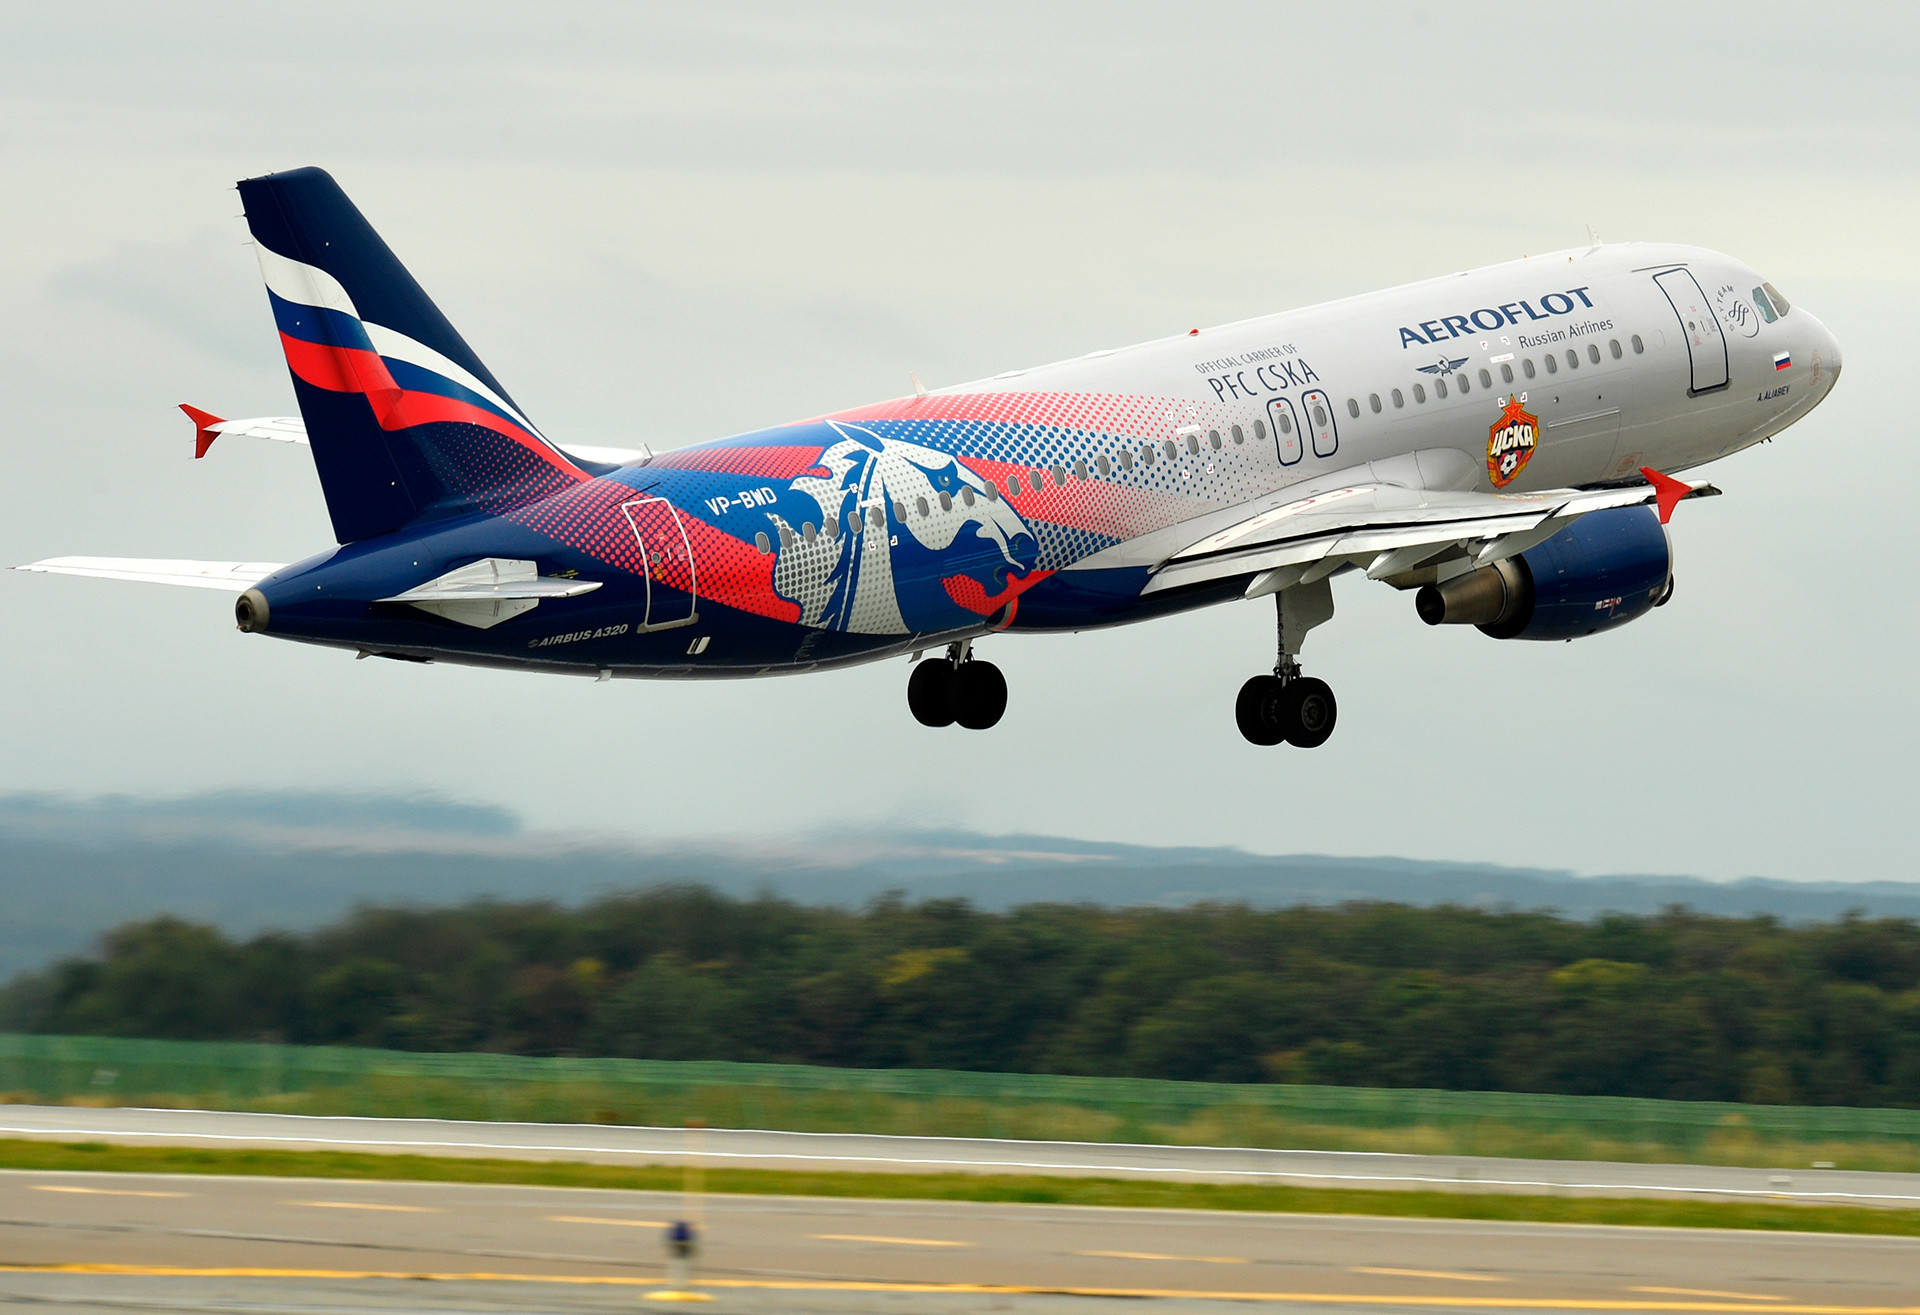 Aeroflot's Airbus-A320 taking off at the Kazan international airport